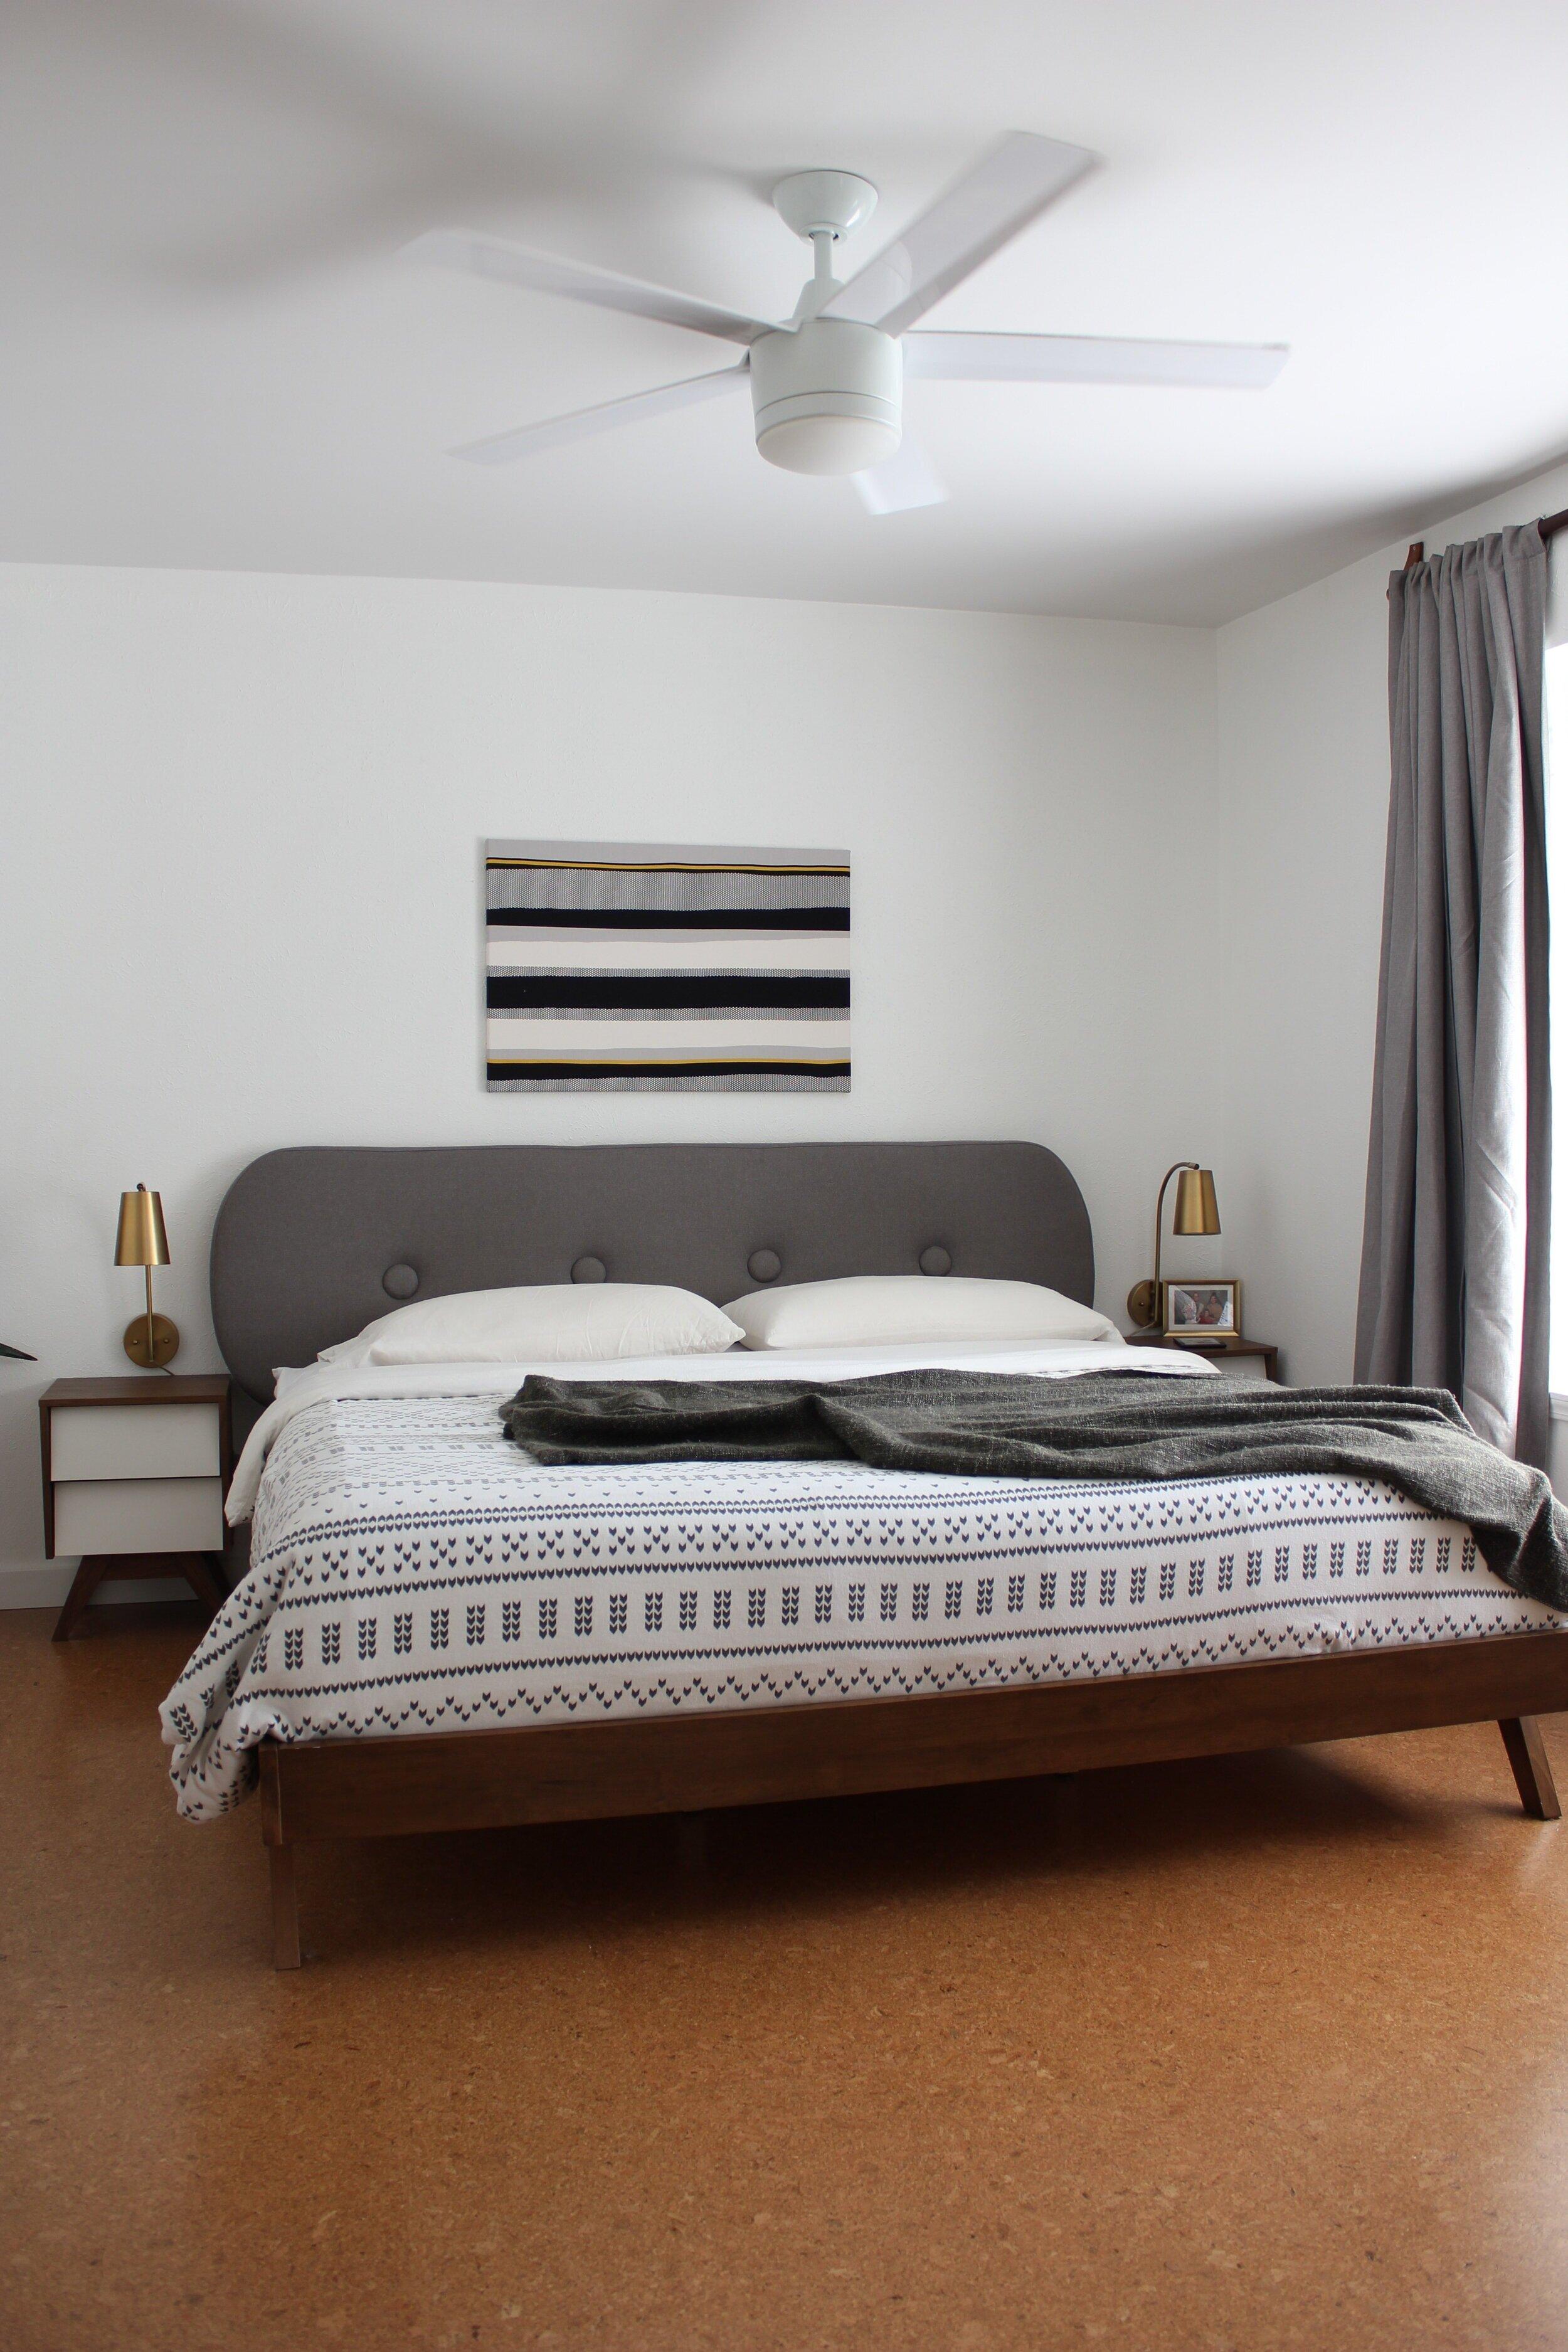 Minimalist+bedroom+before+makeover+rounded+headboard.jpg